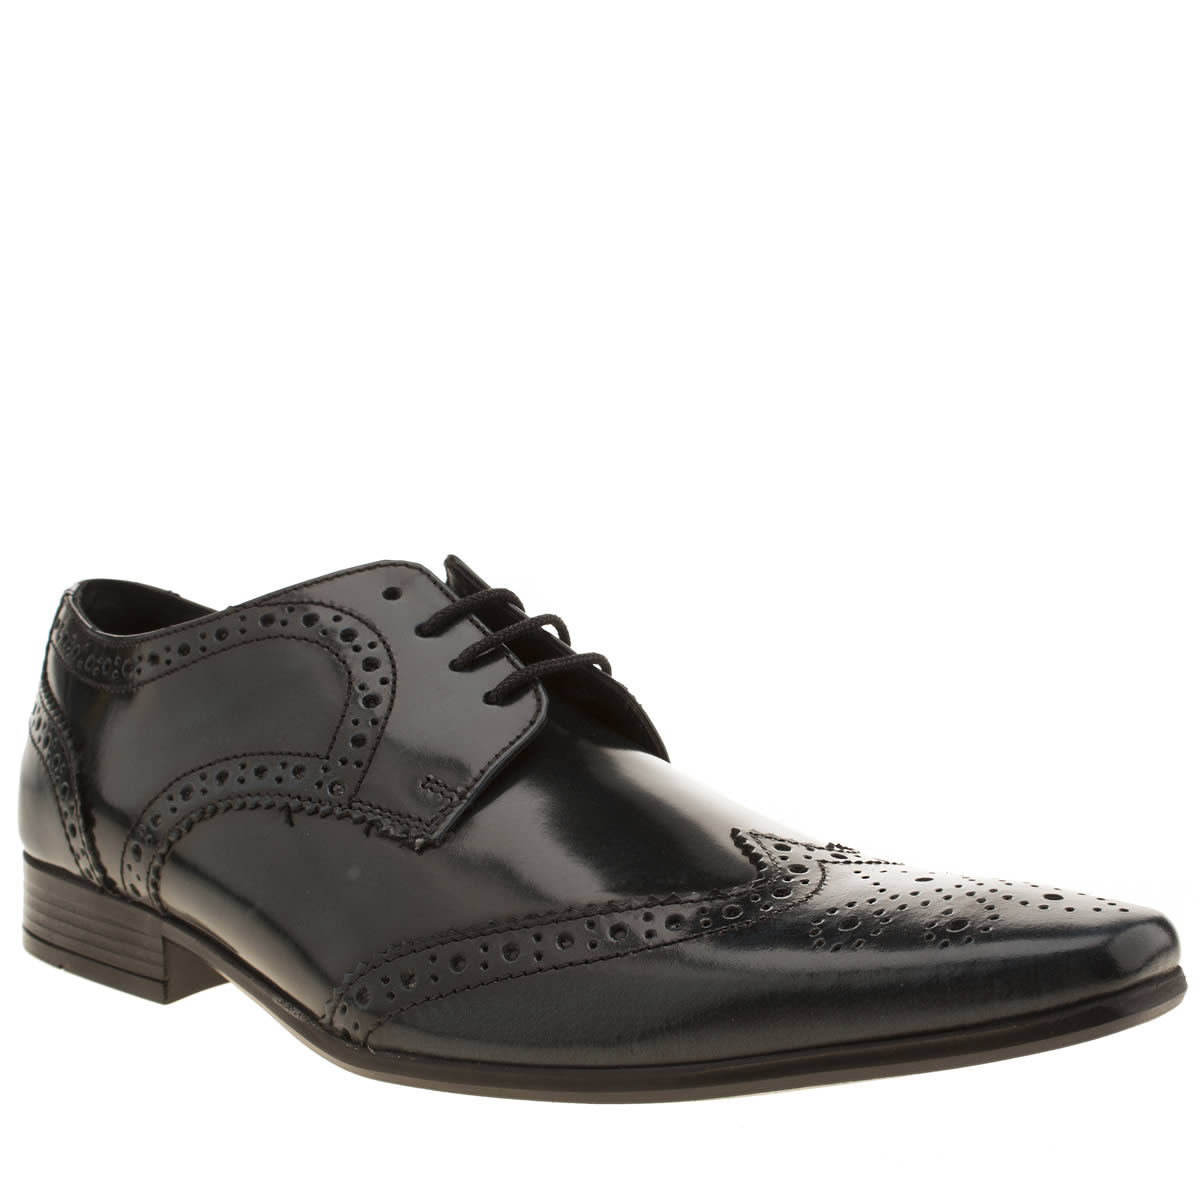 Ikon Ikon Blue Hugo Wing Brogue Shoes